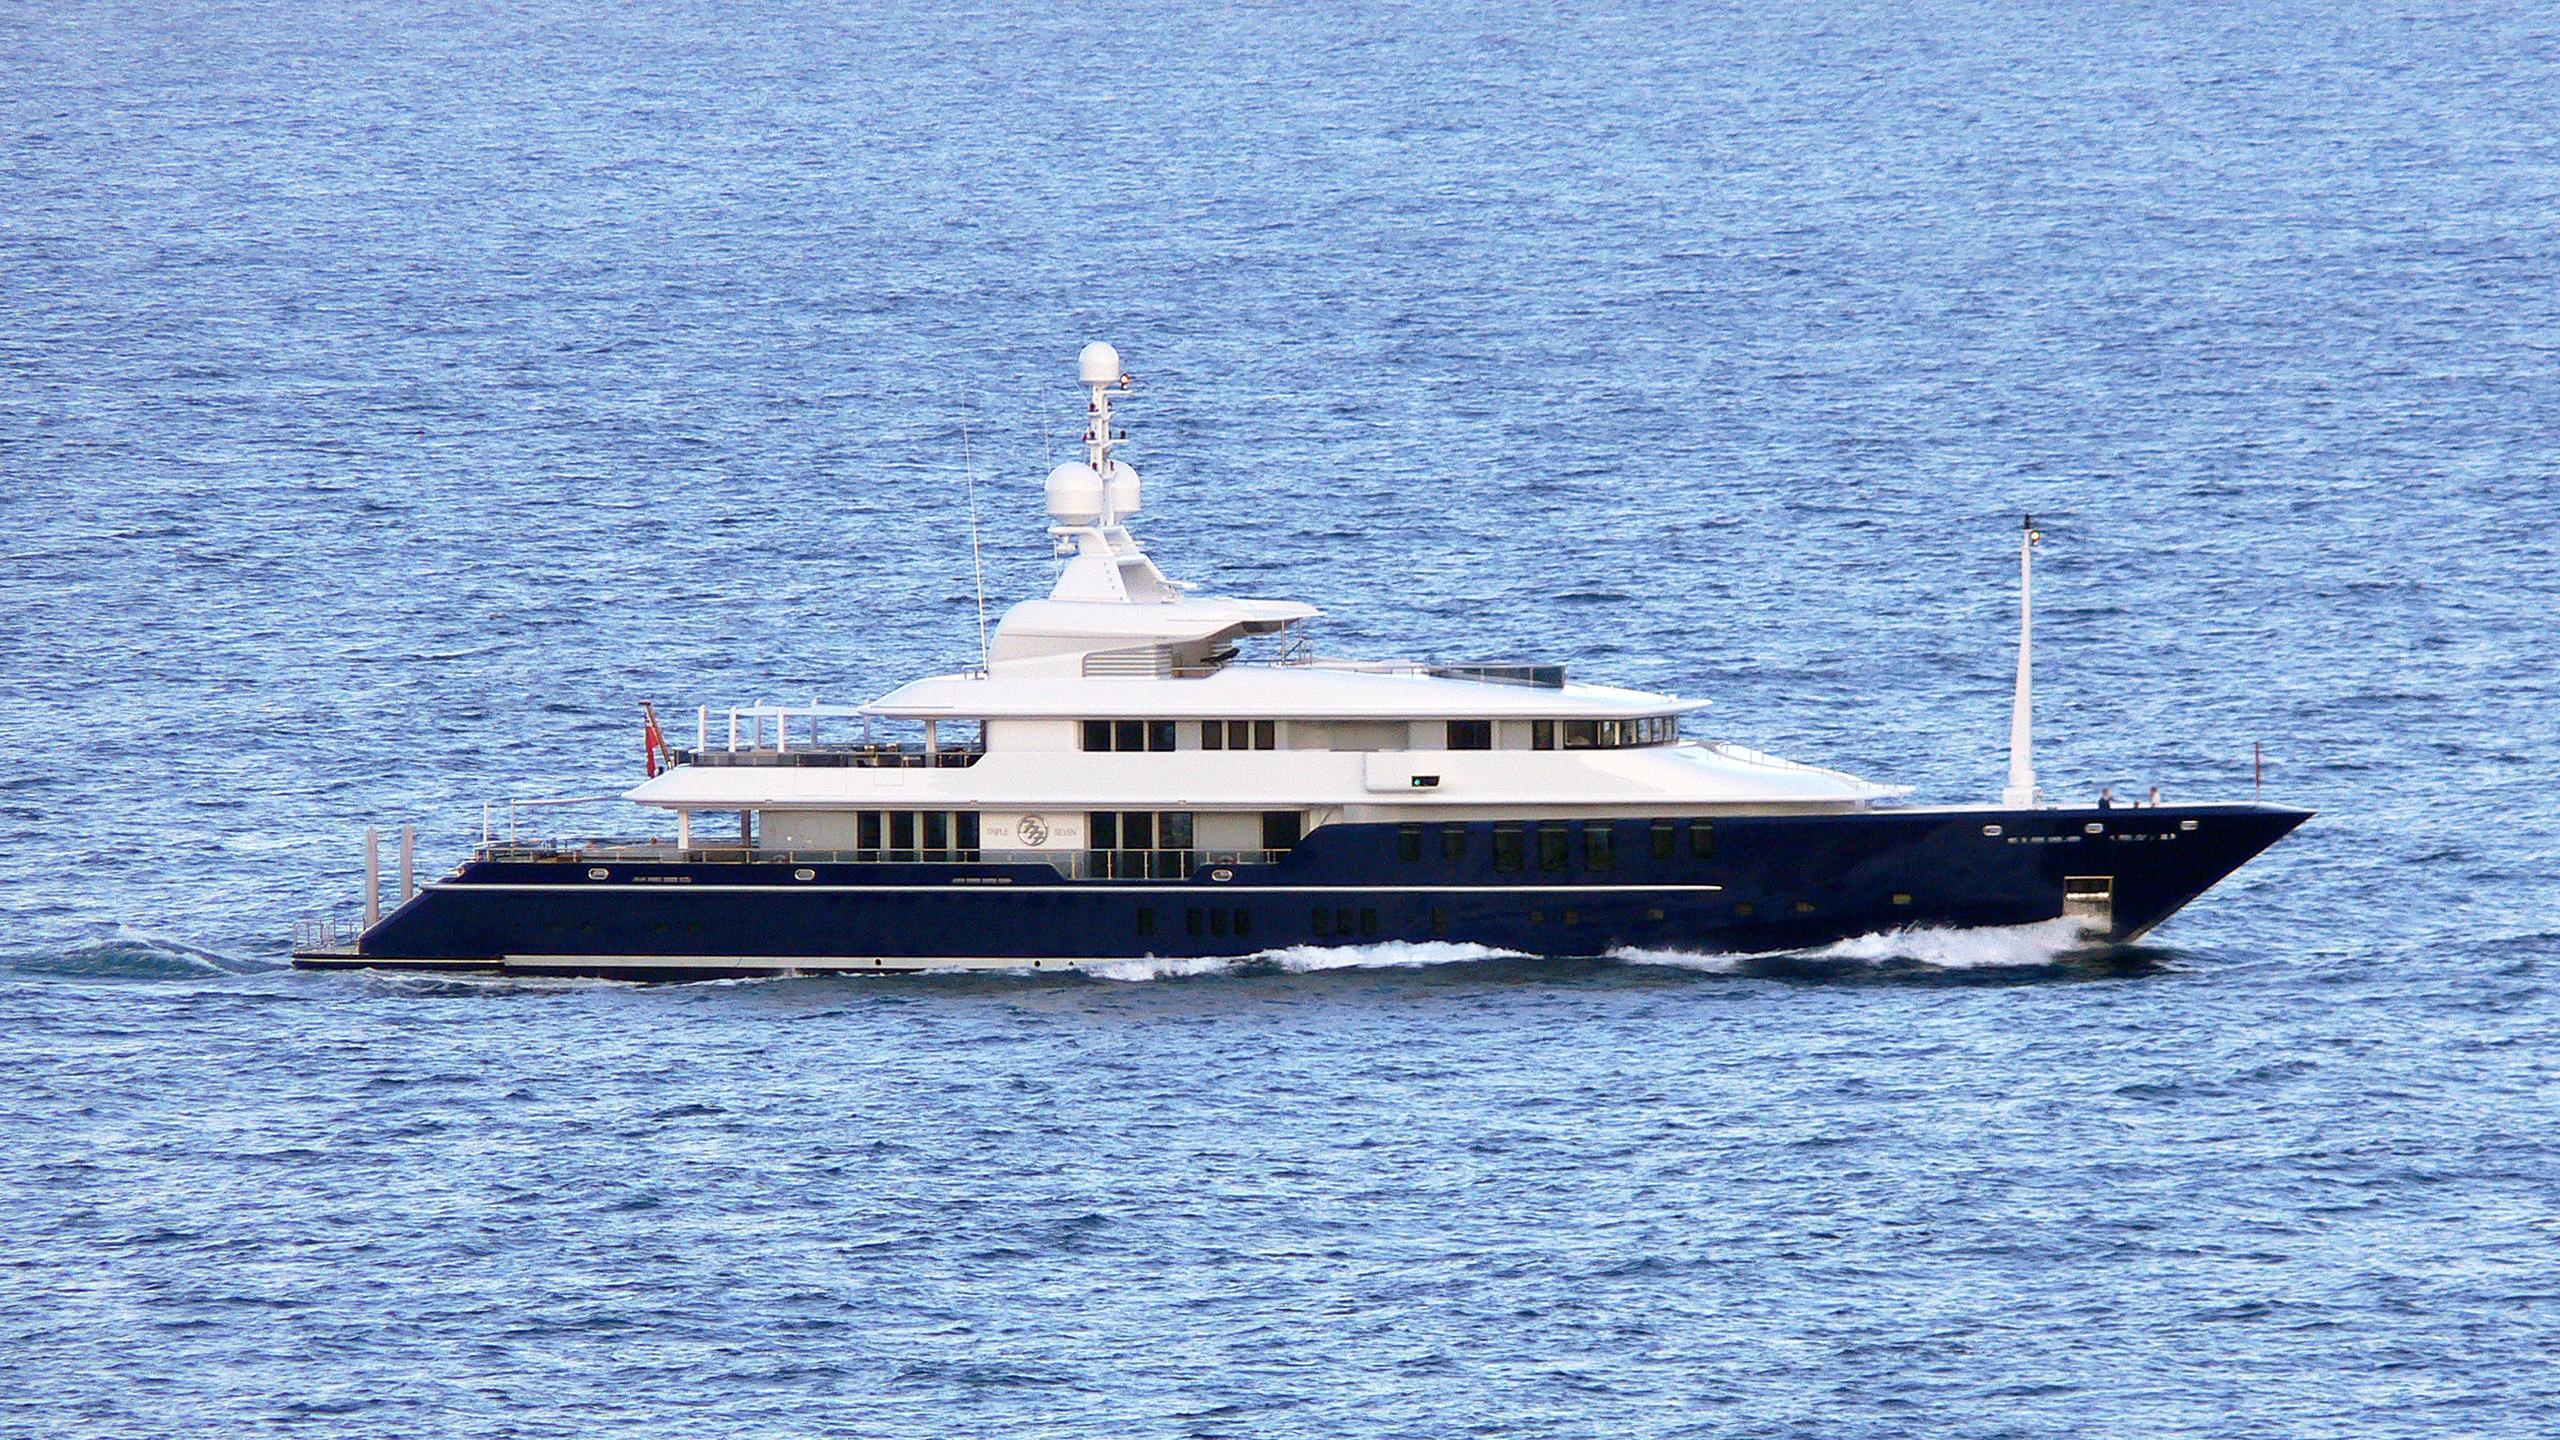 triple-seven-motor-yacht-nobiskrug-2006-68m-cruising-profile